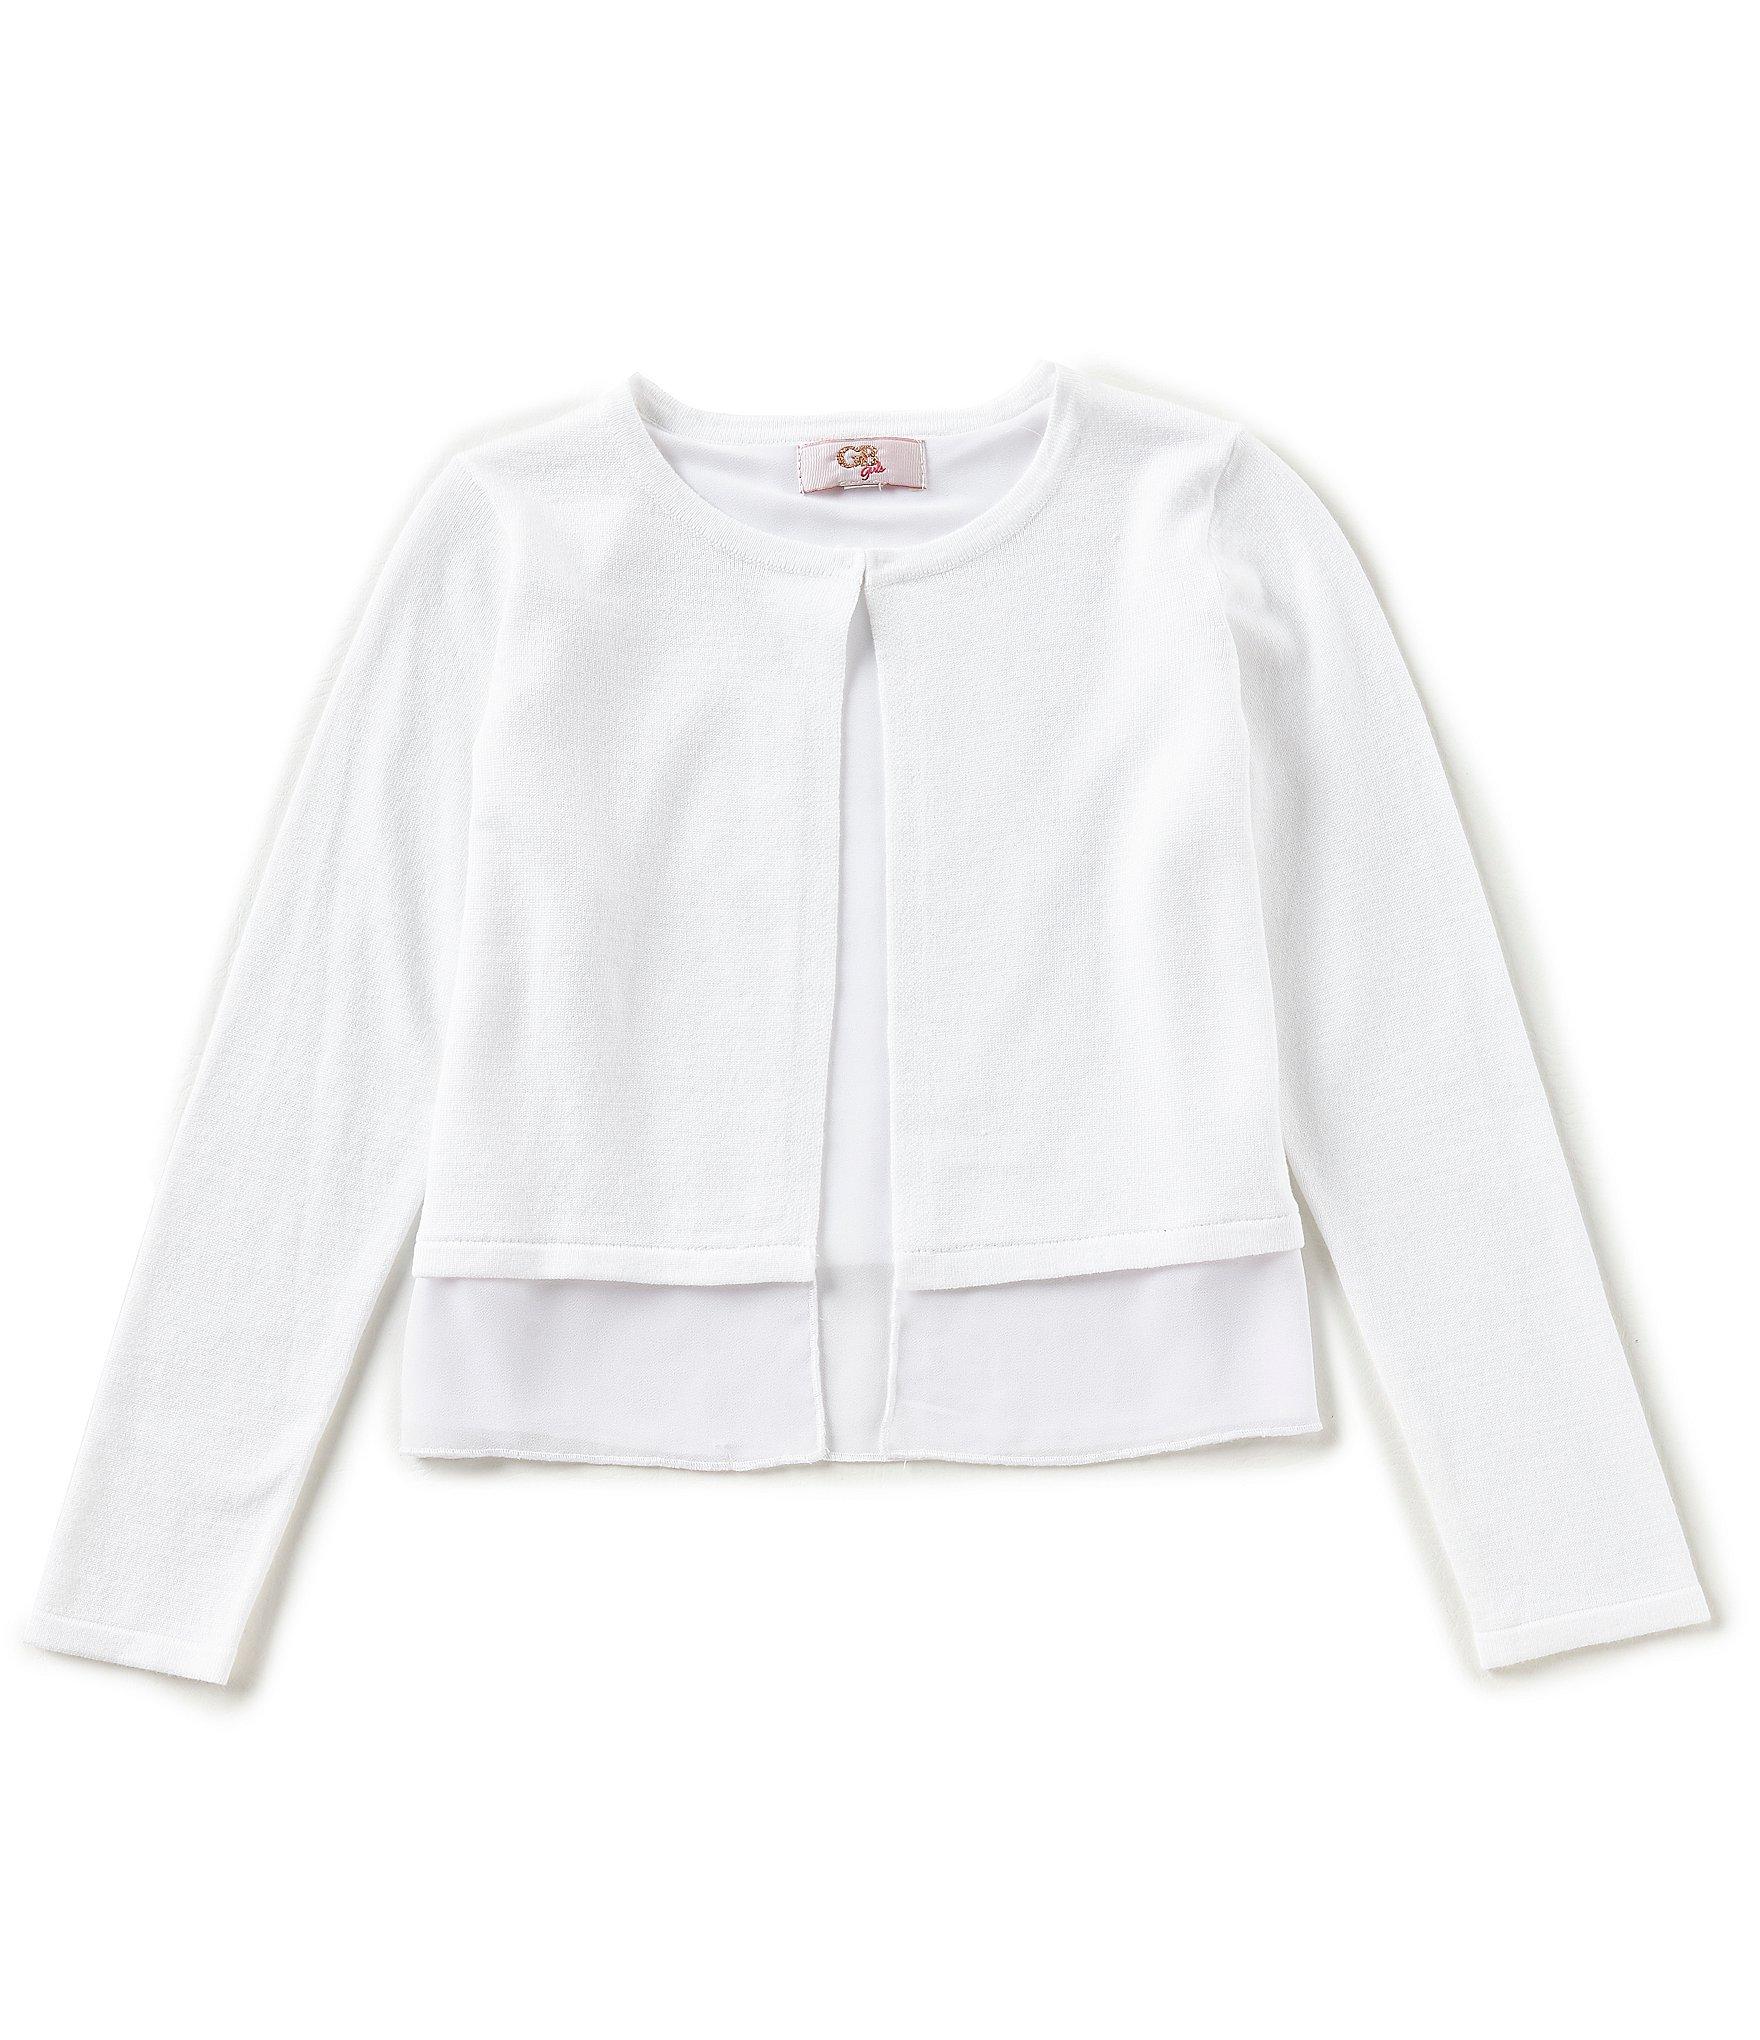 49dcc8c825 Girls  Sweaters   Cardigans